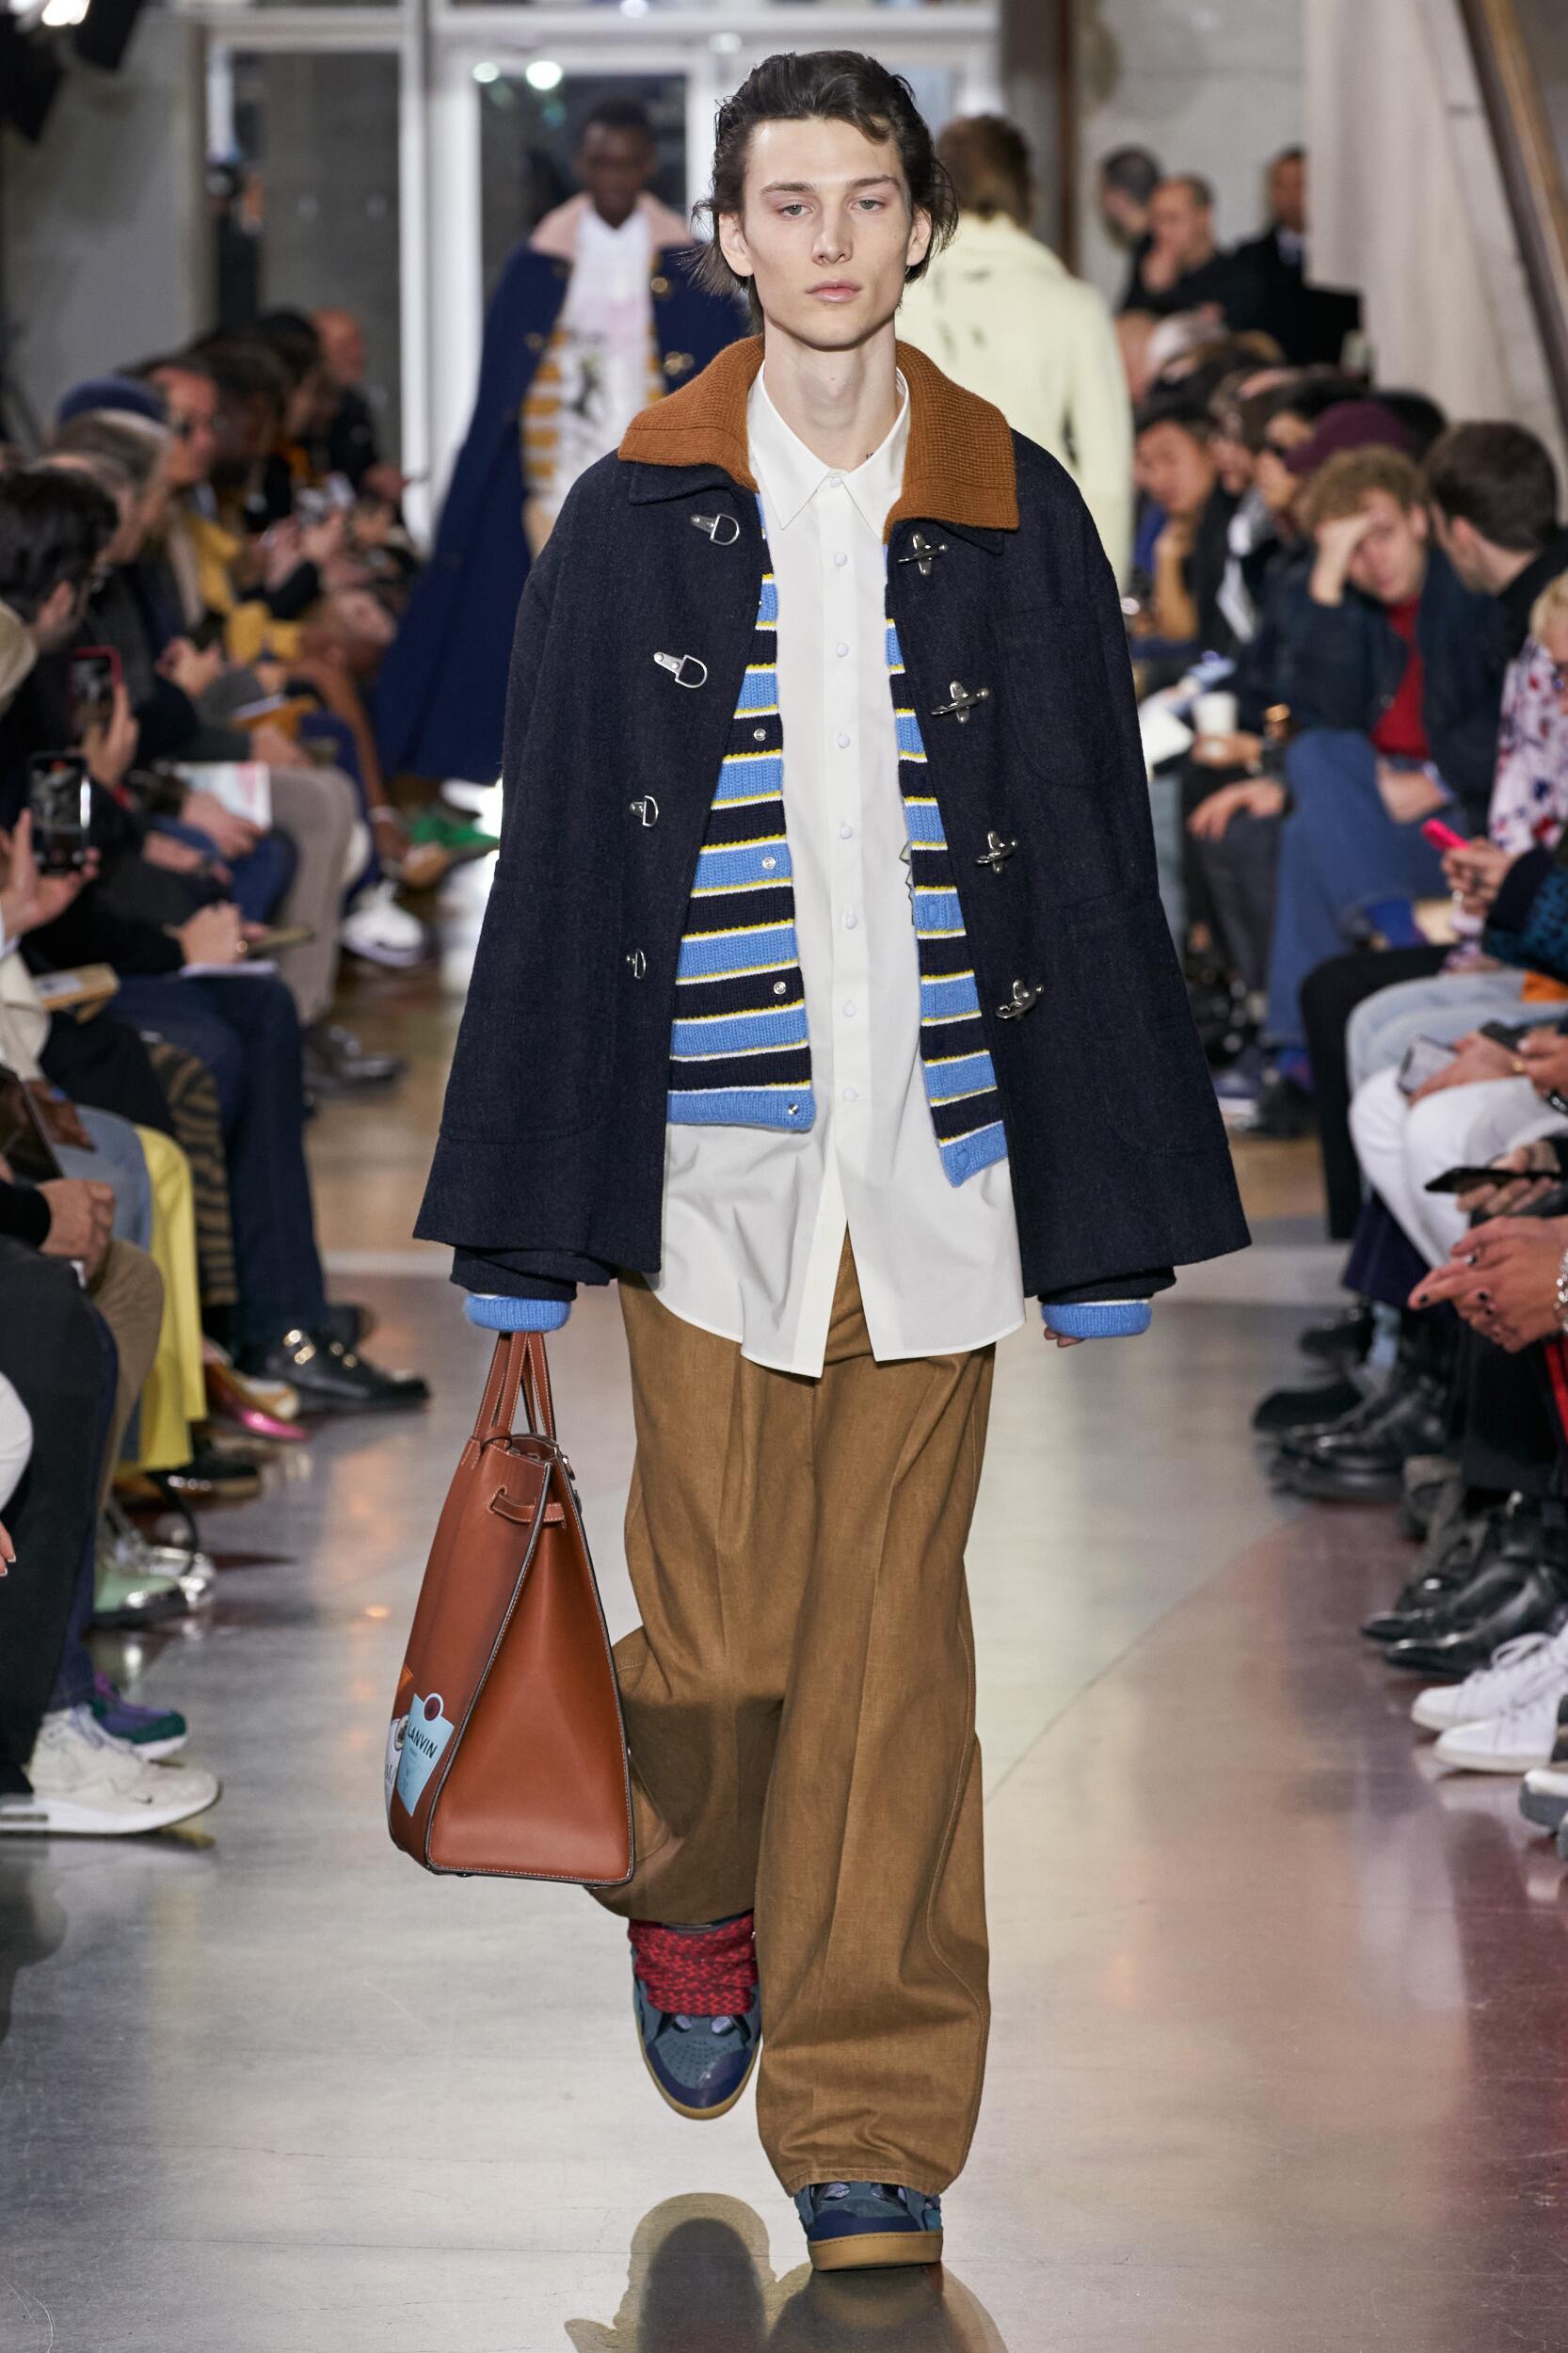 2020 Catwalk Lanvin Man Fashion Show Winter